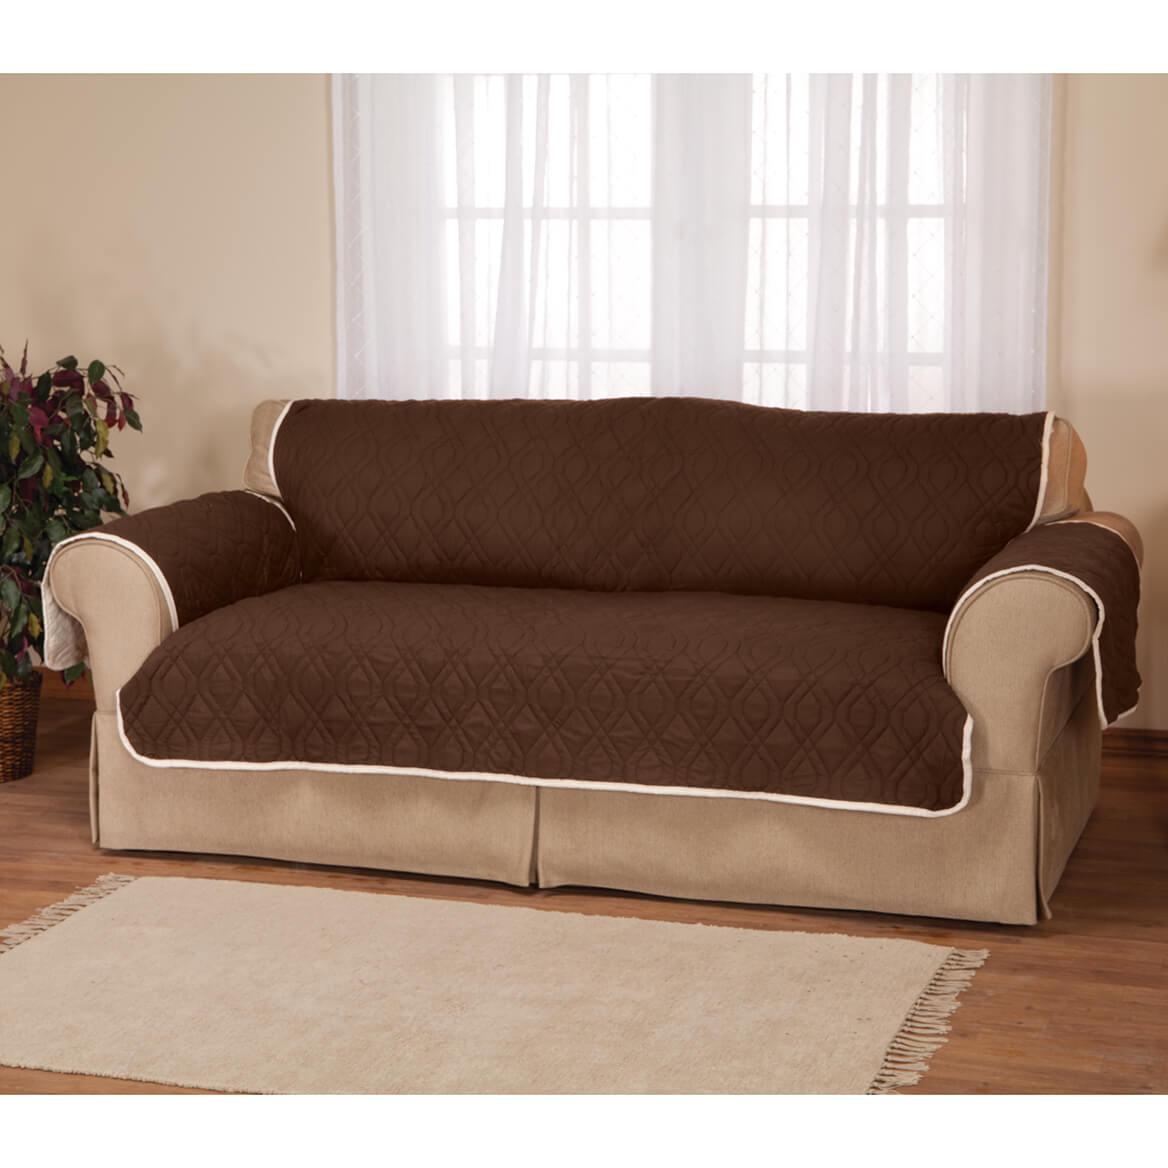 5 Star Reversible Waterproof Extra-Long Sofa Protector-358586